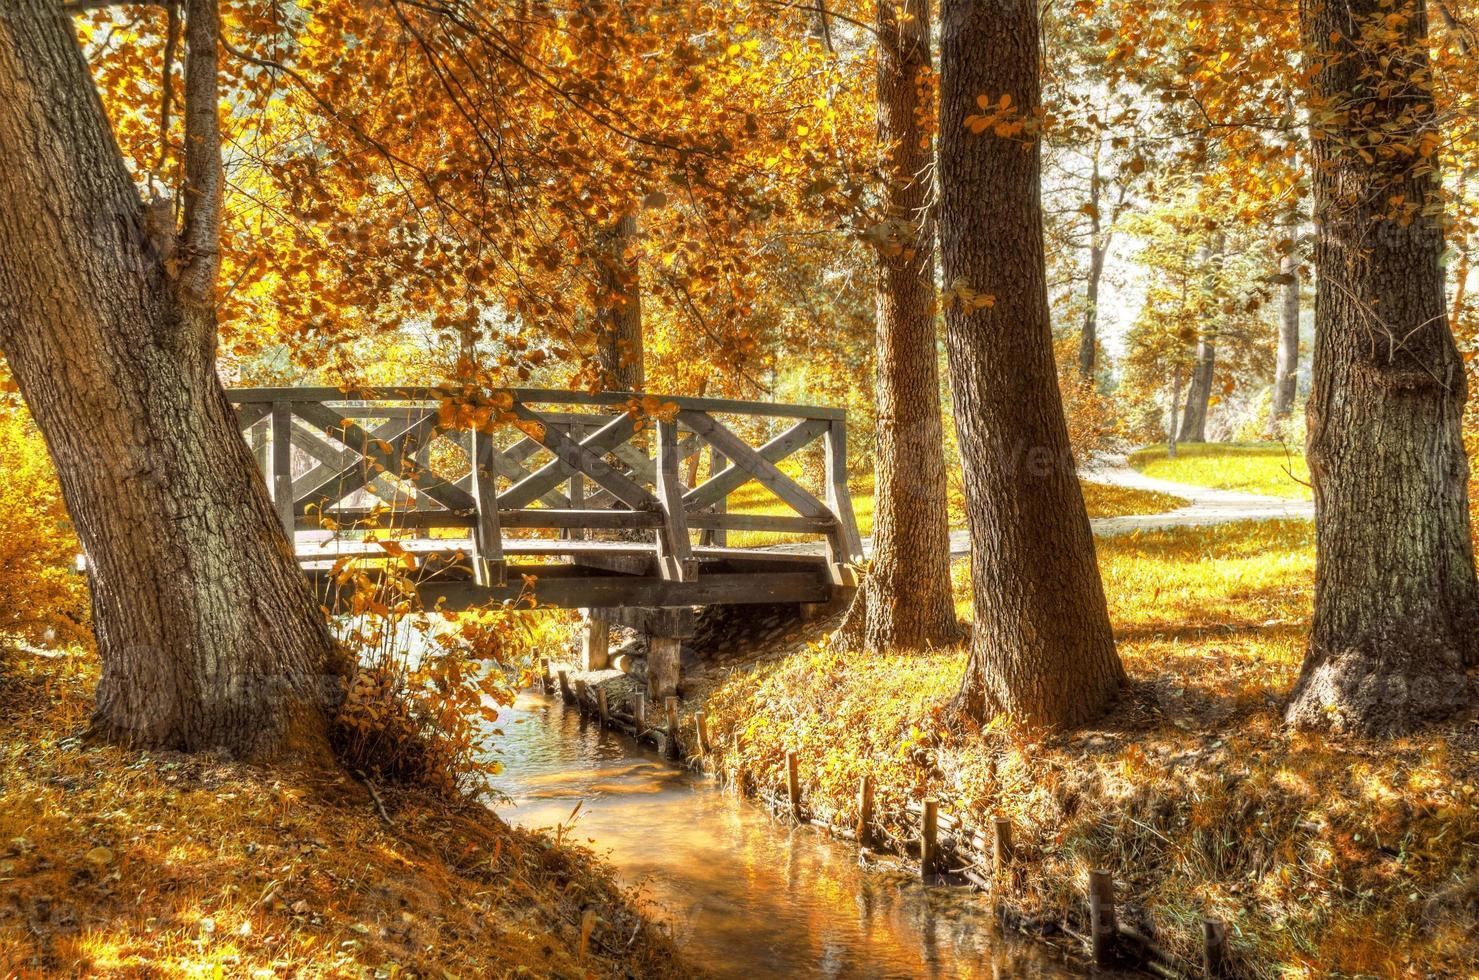 Autumn scenery. photo